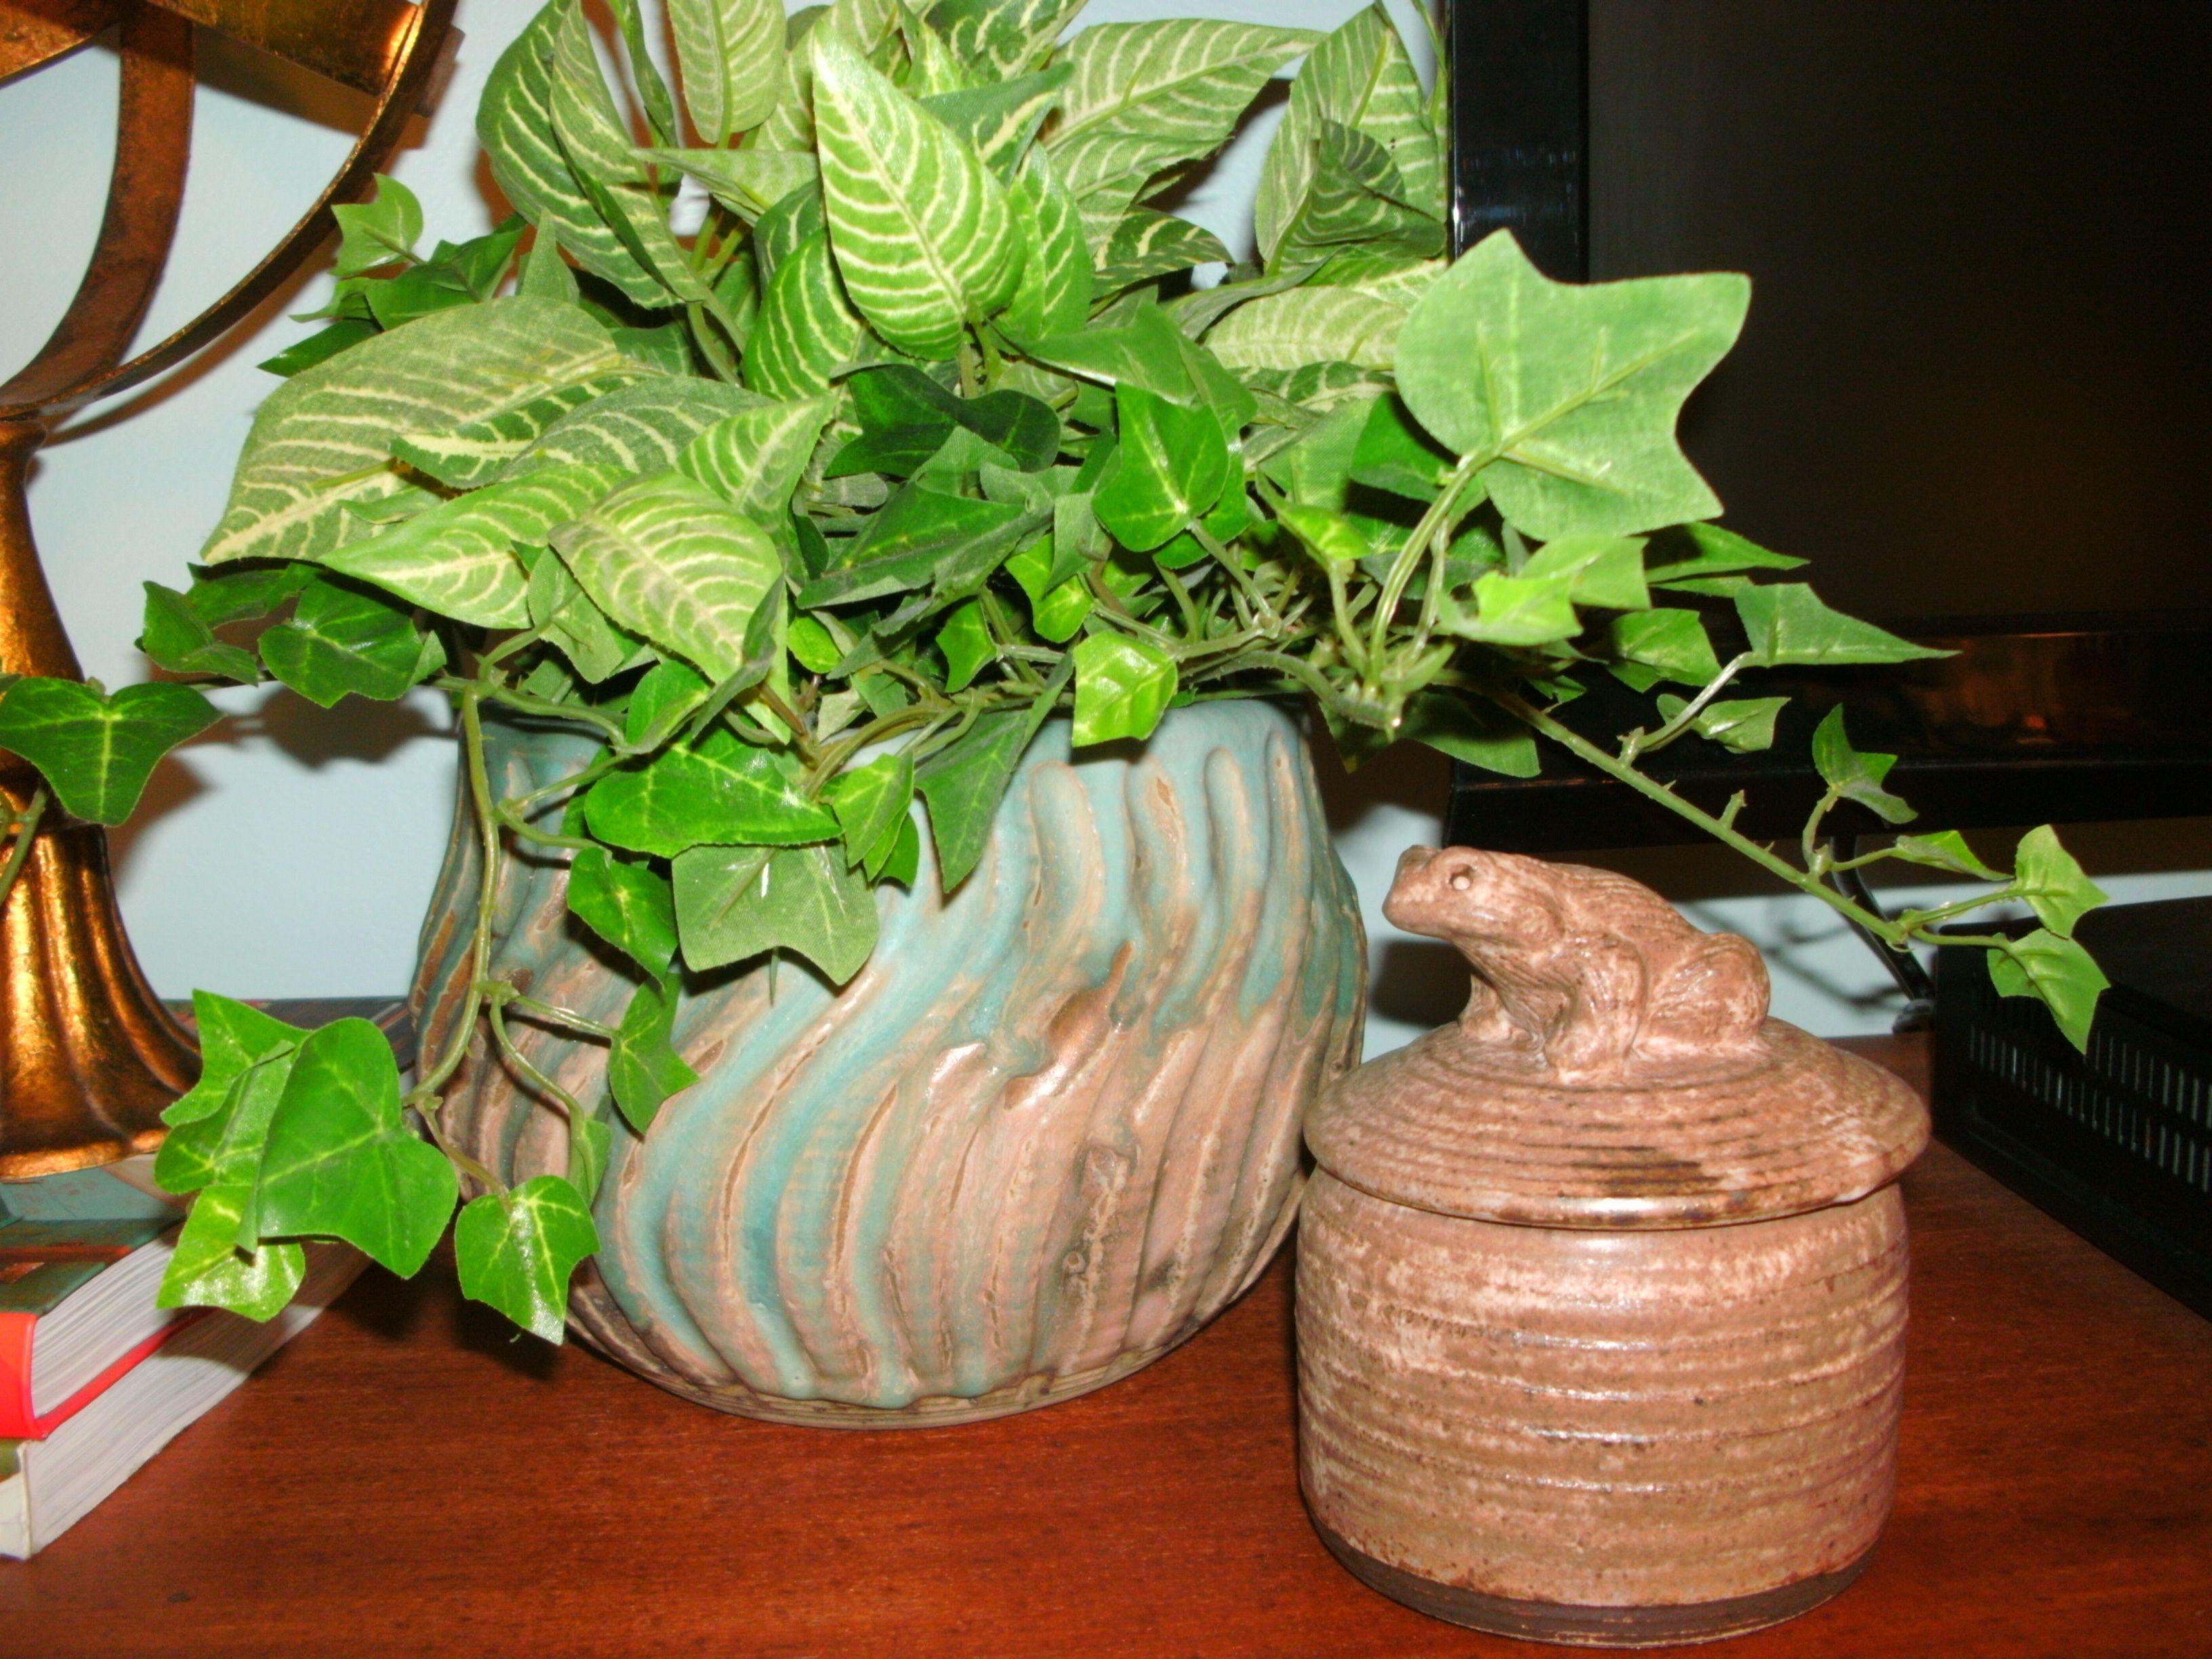 McCarty pottery mum pot and peteru0027s pottery candy dish. & McCarty pottery mum pot and peteru0027s pottery candy dish. | McCarty ...